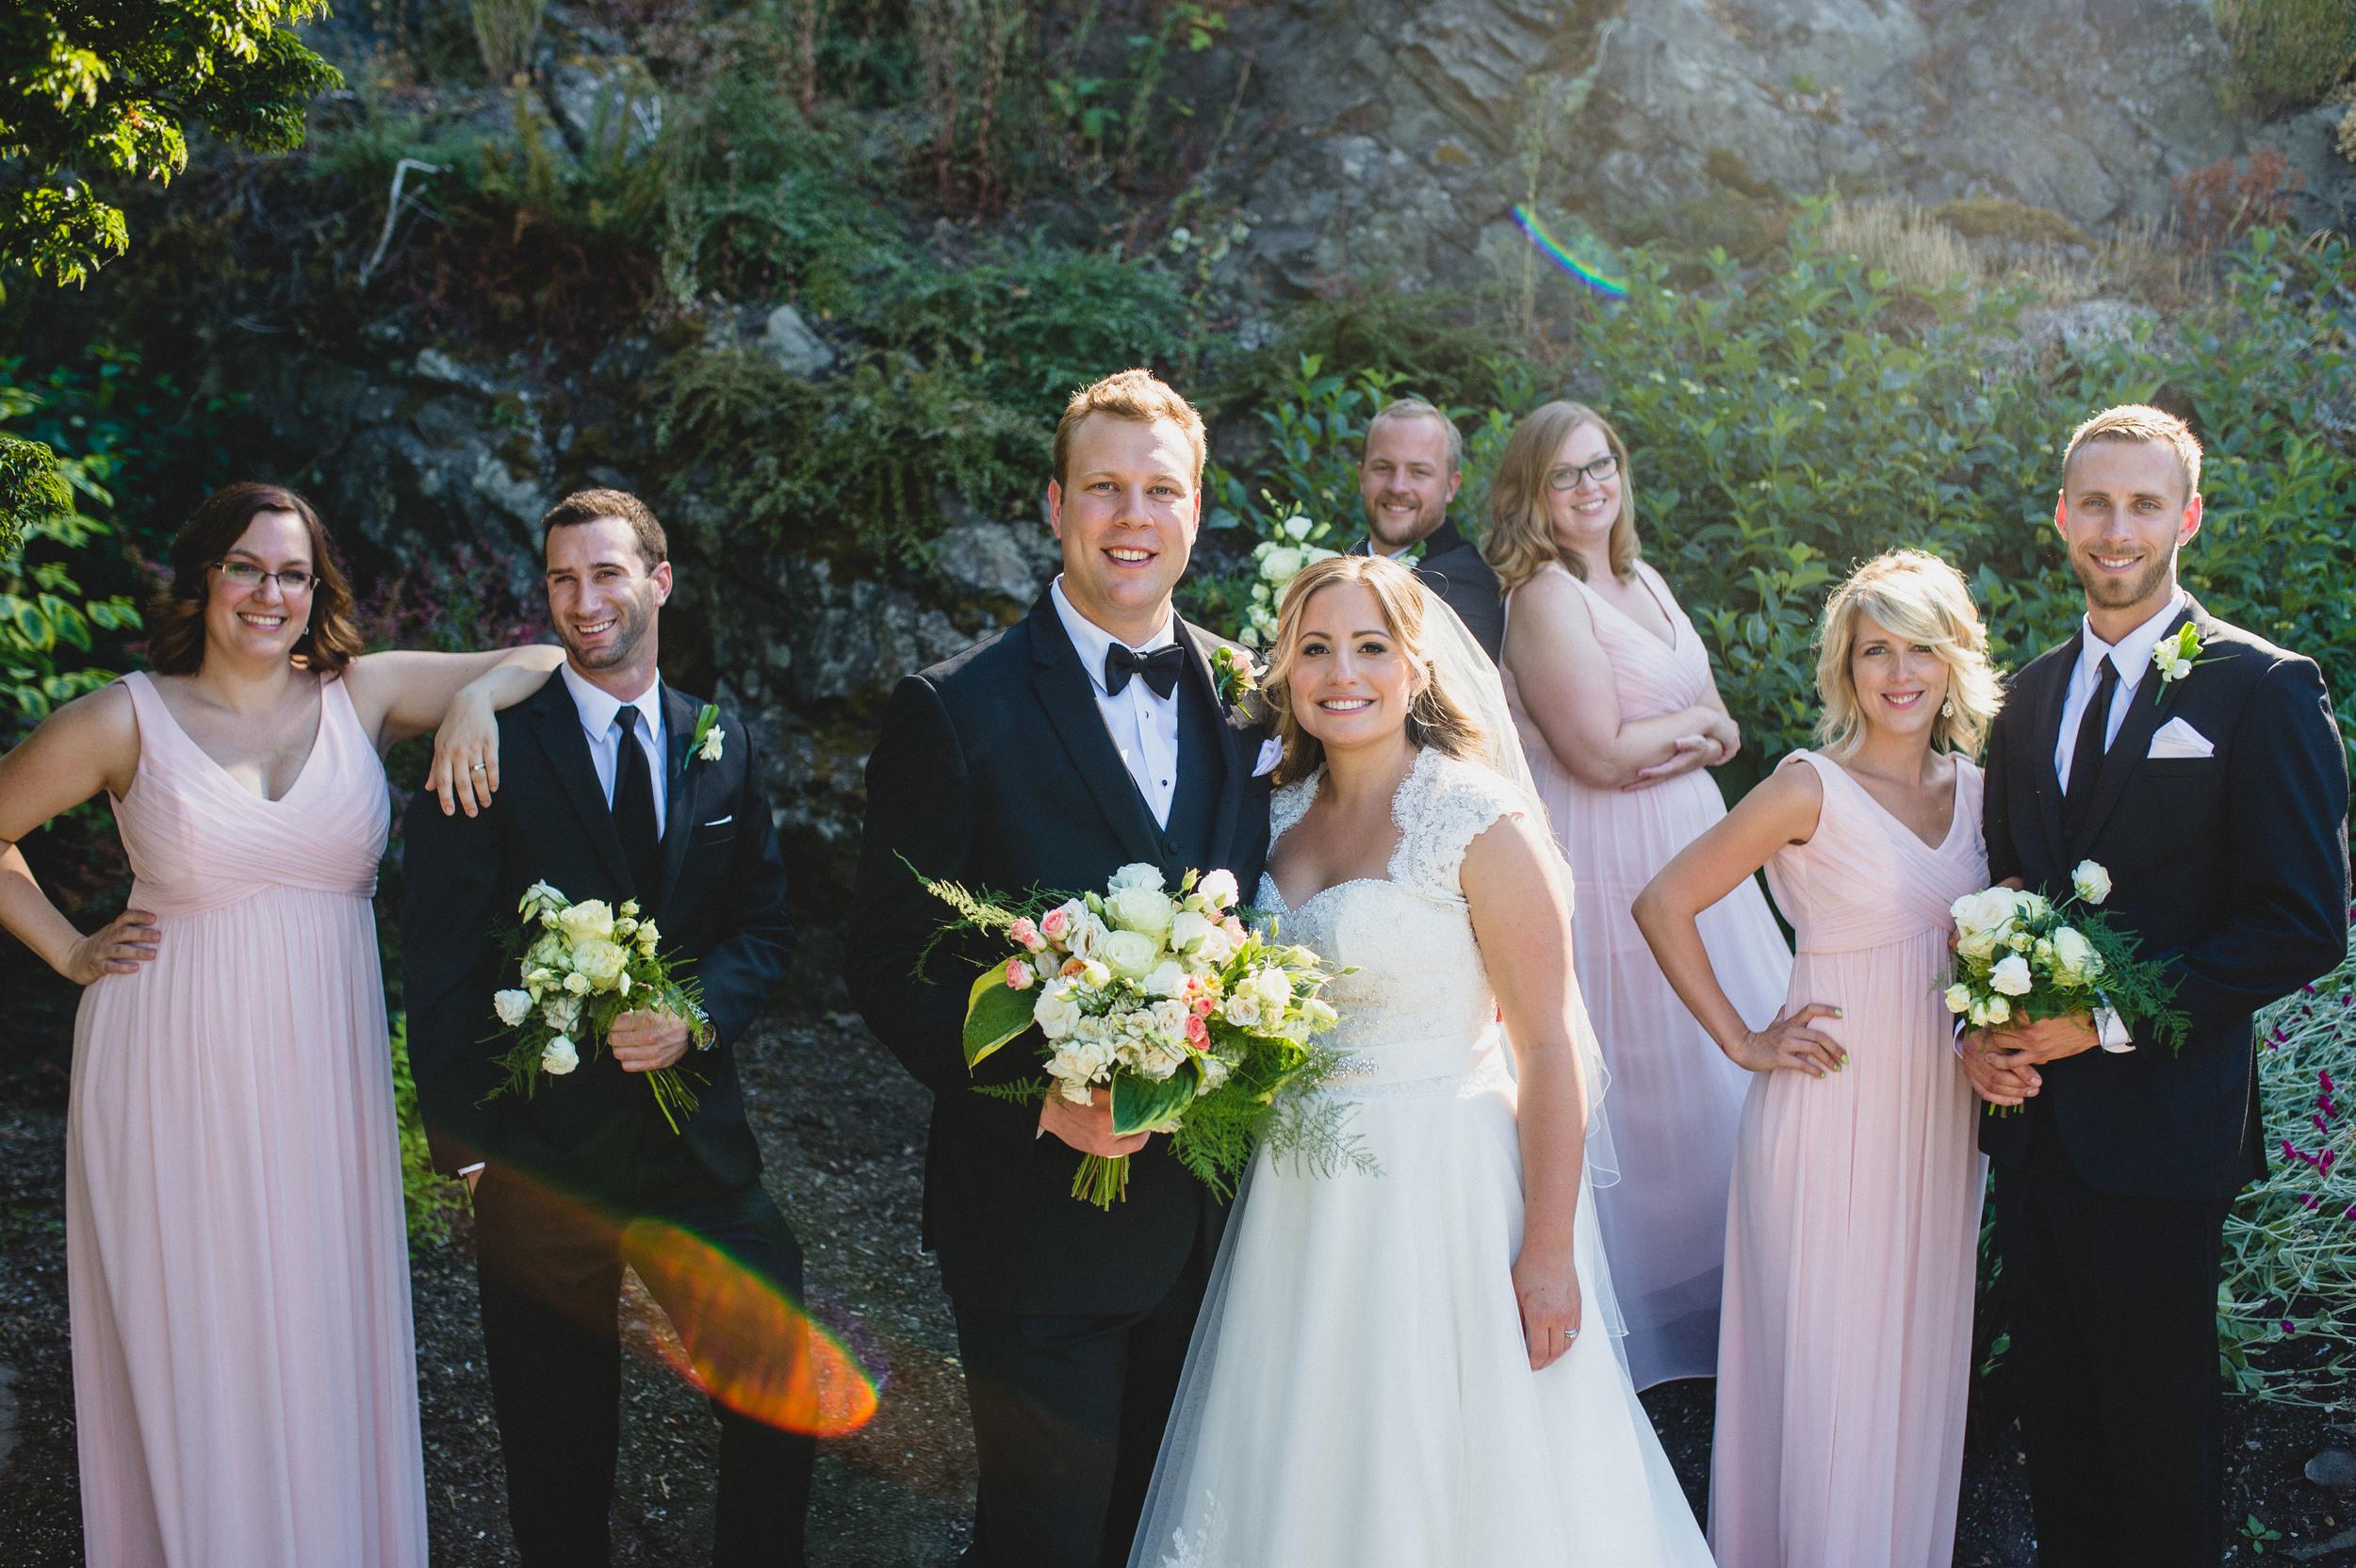 Vancouver St Augustine 's Church wedding photographer edward lai photography-70.jpg